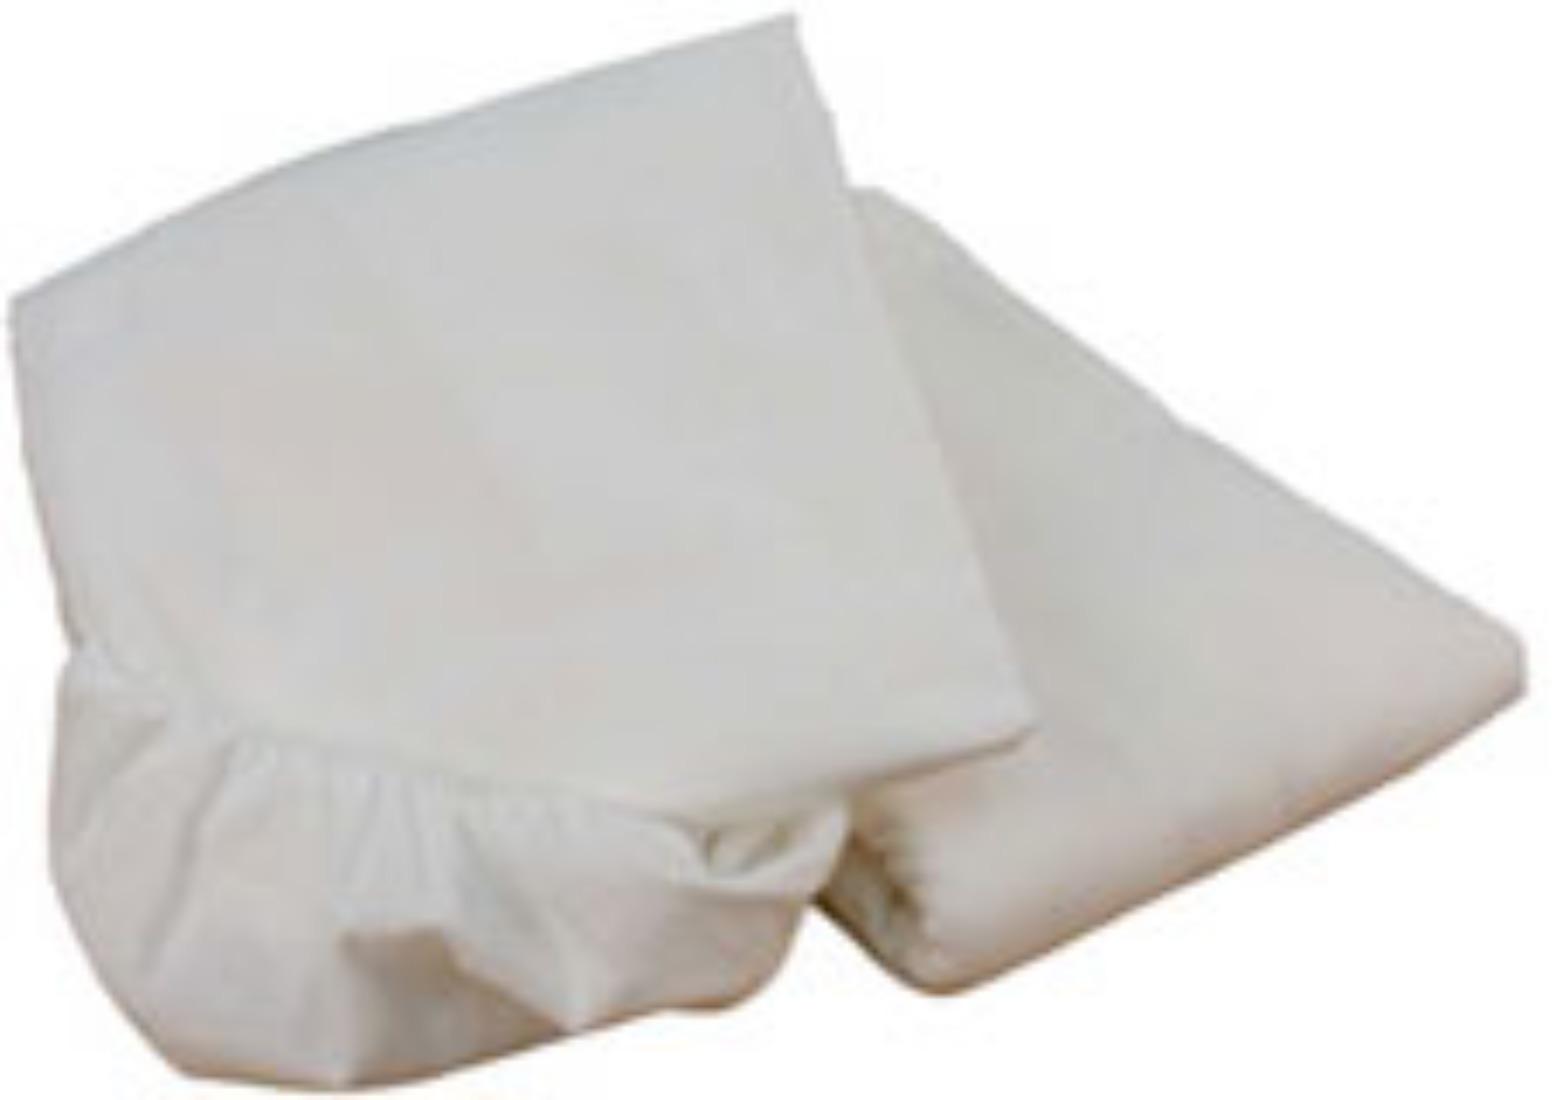 fitted sheet for pram crib mattresses. Black Bedroom Furniture Sets. Home Design Ideas